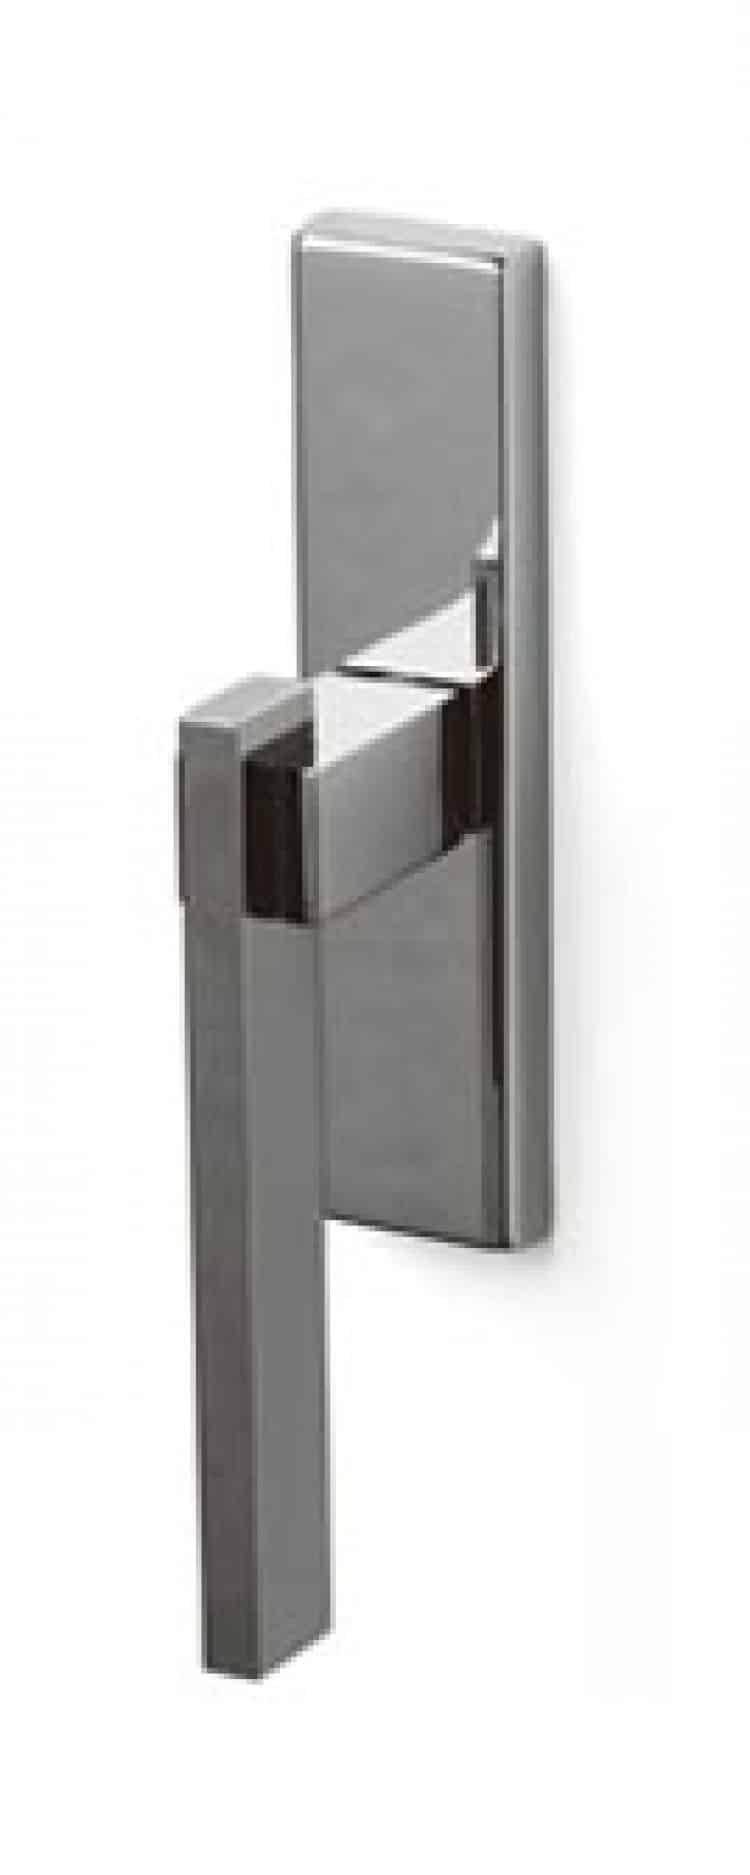 Olivari serie minerva maniglie per finestre cremonese - Maniglie finestre prezzi ...